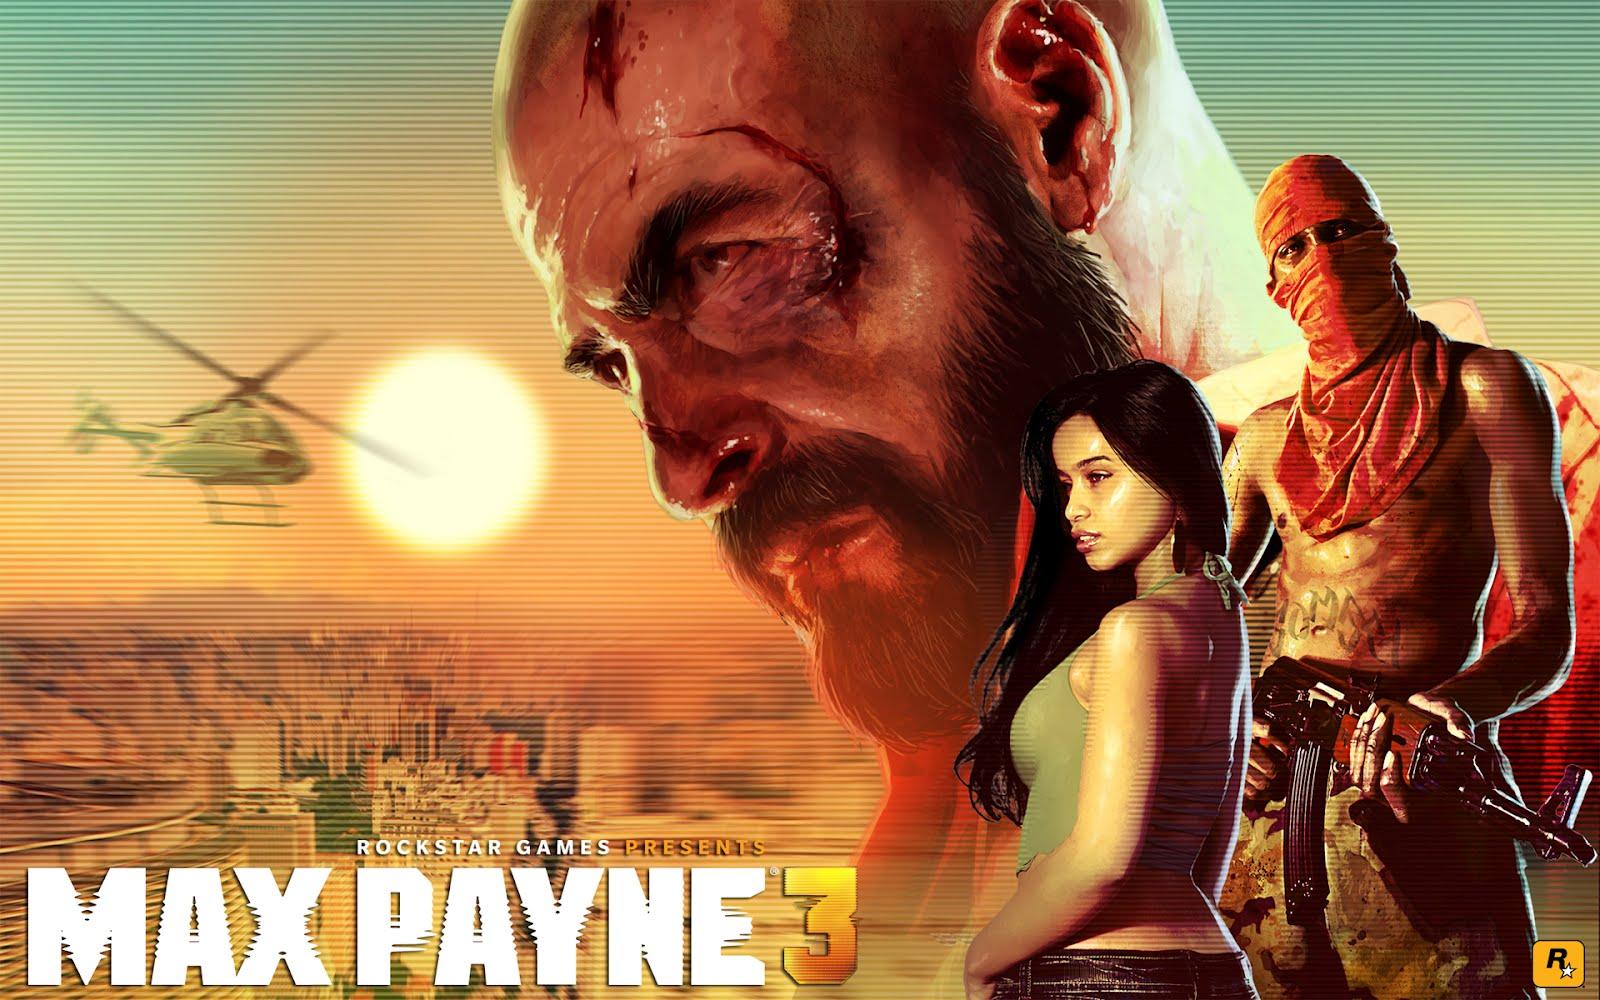 http://2.bp.blogspot.com/-TWea_k7Nc3k/T082j5H1KJI/AAAAAAAABgc/ruPkc32sN7Q/s1600/2012_max_payne_3-wide.jpg